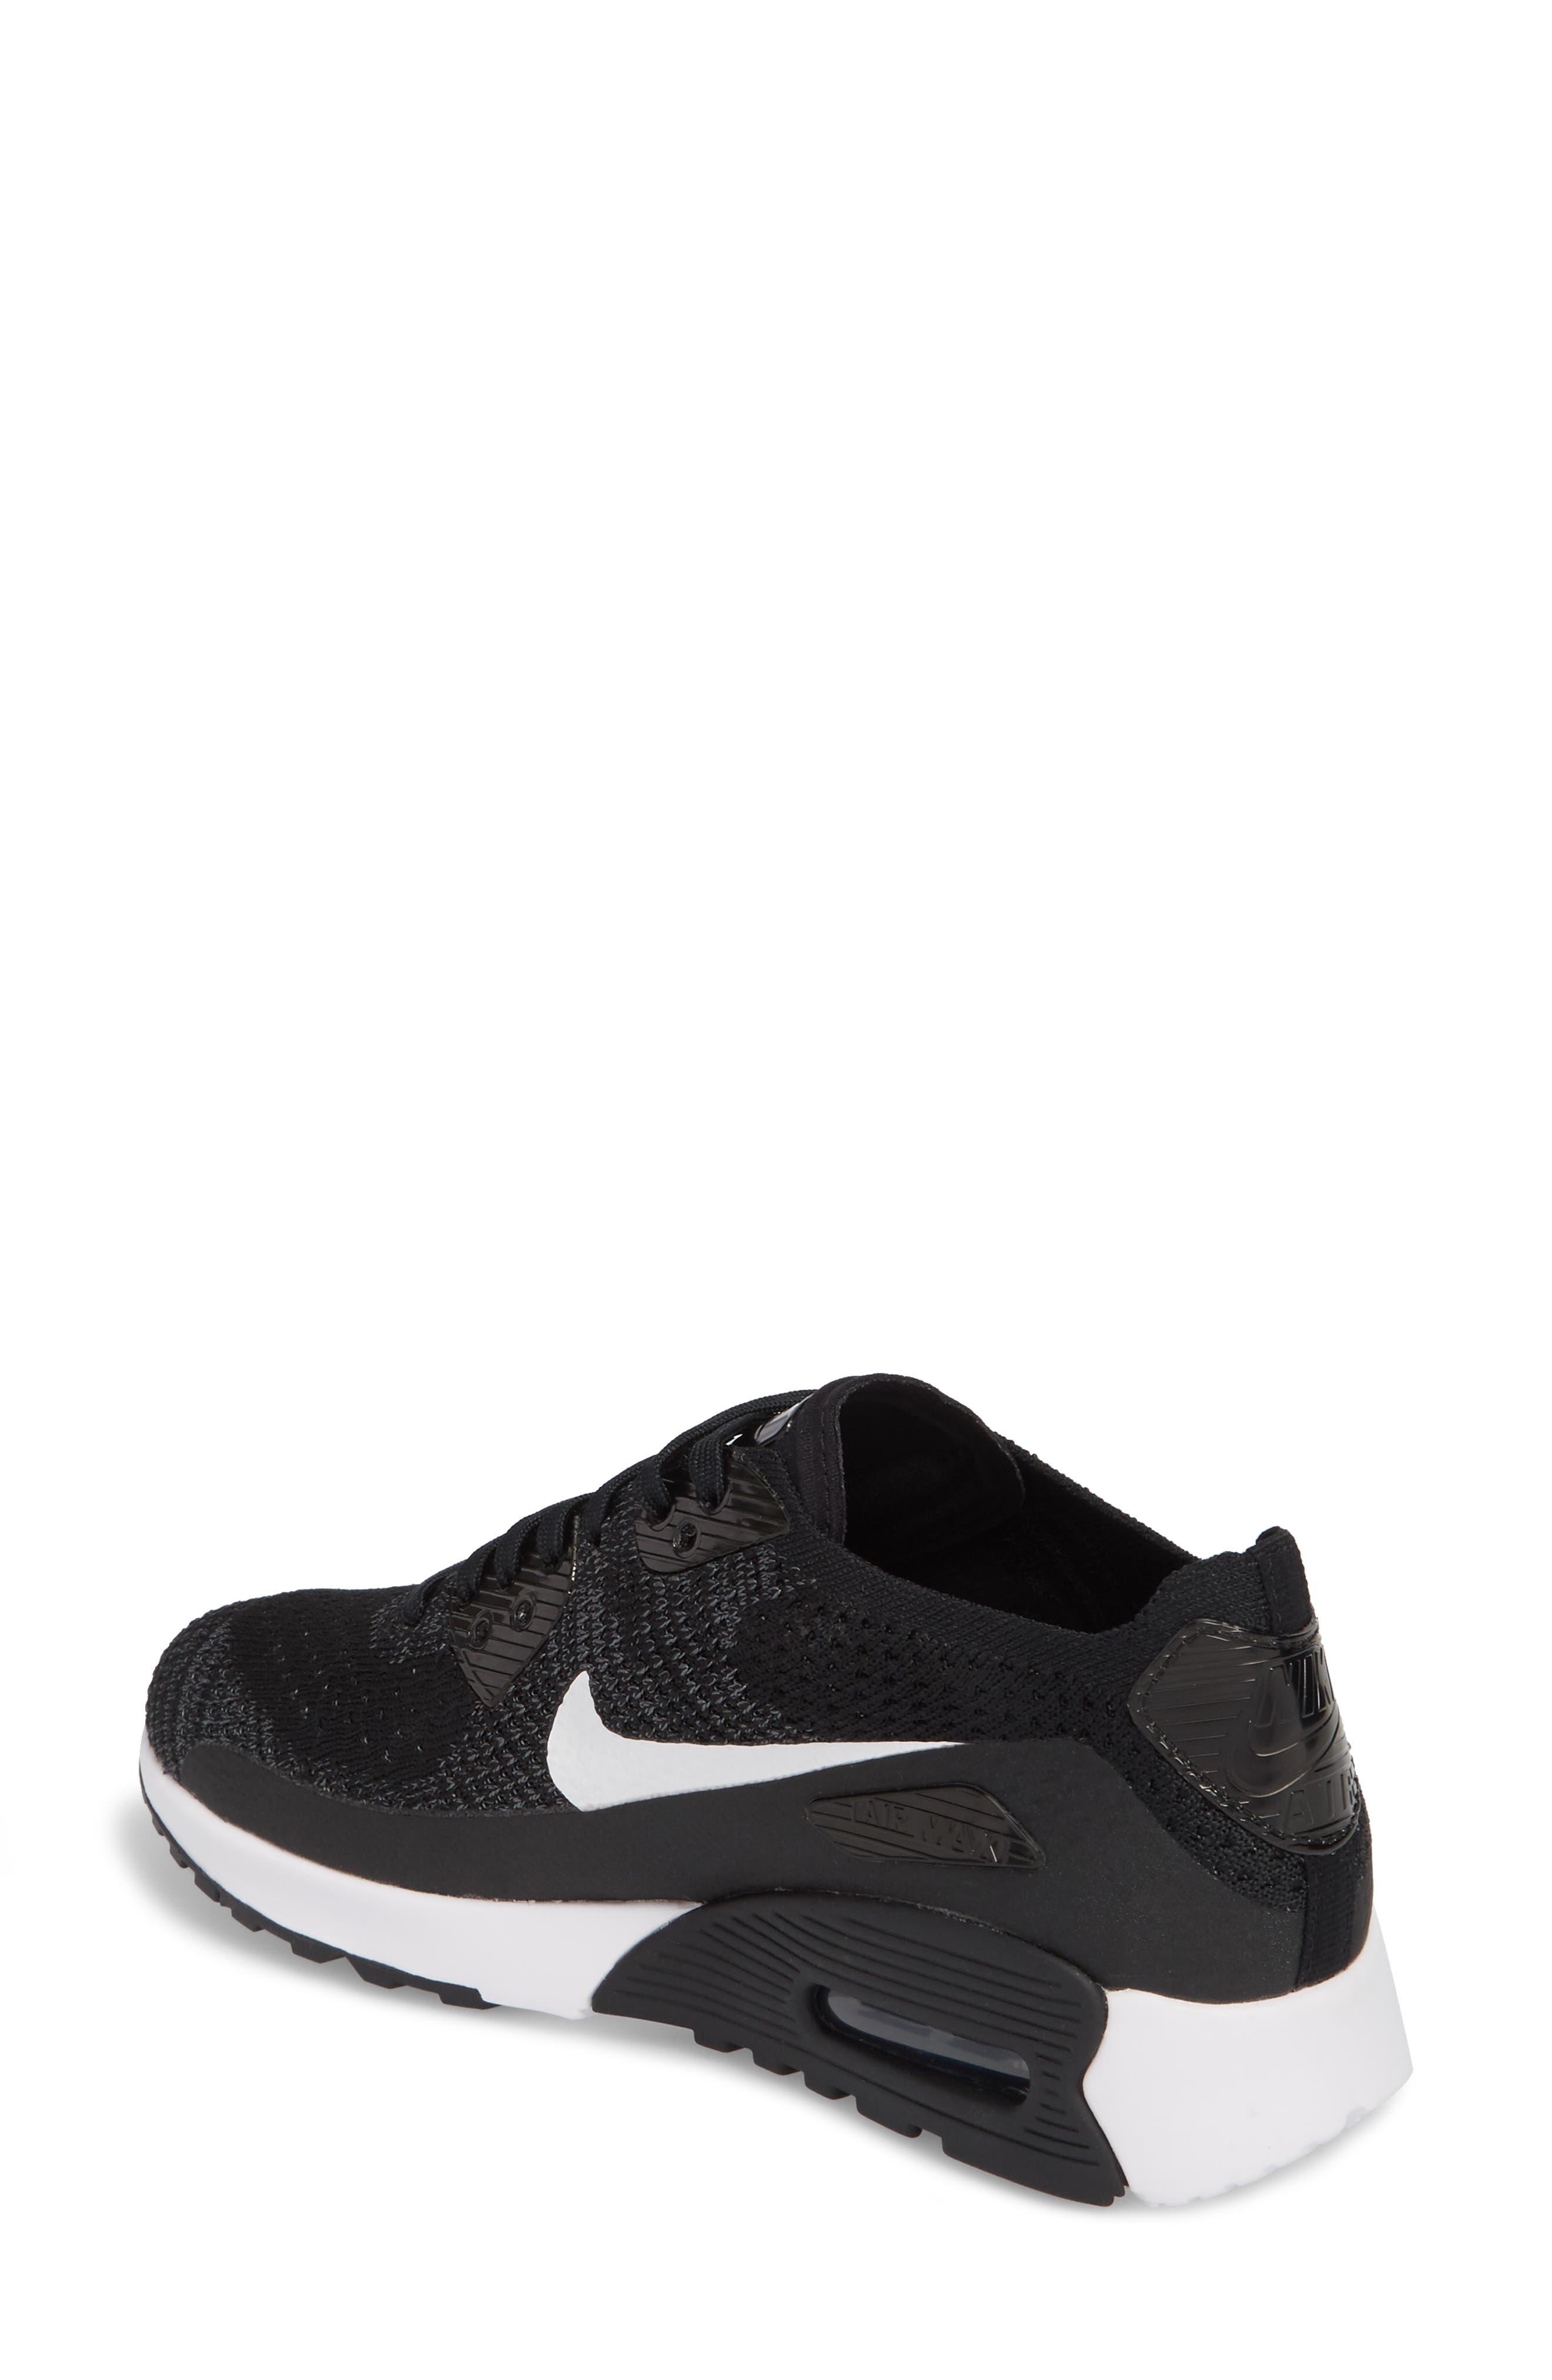 NIKE,                             Air Max 90 Flyknit Ultra 2.0 Sneaker,                             Alternate thumbnail 2, color,                             004